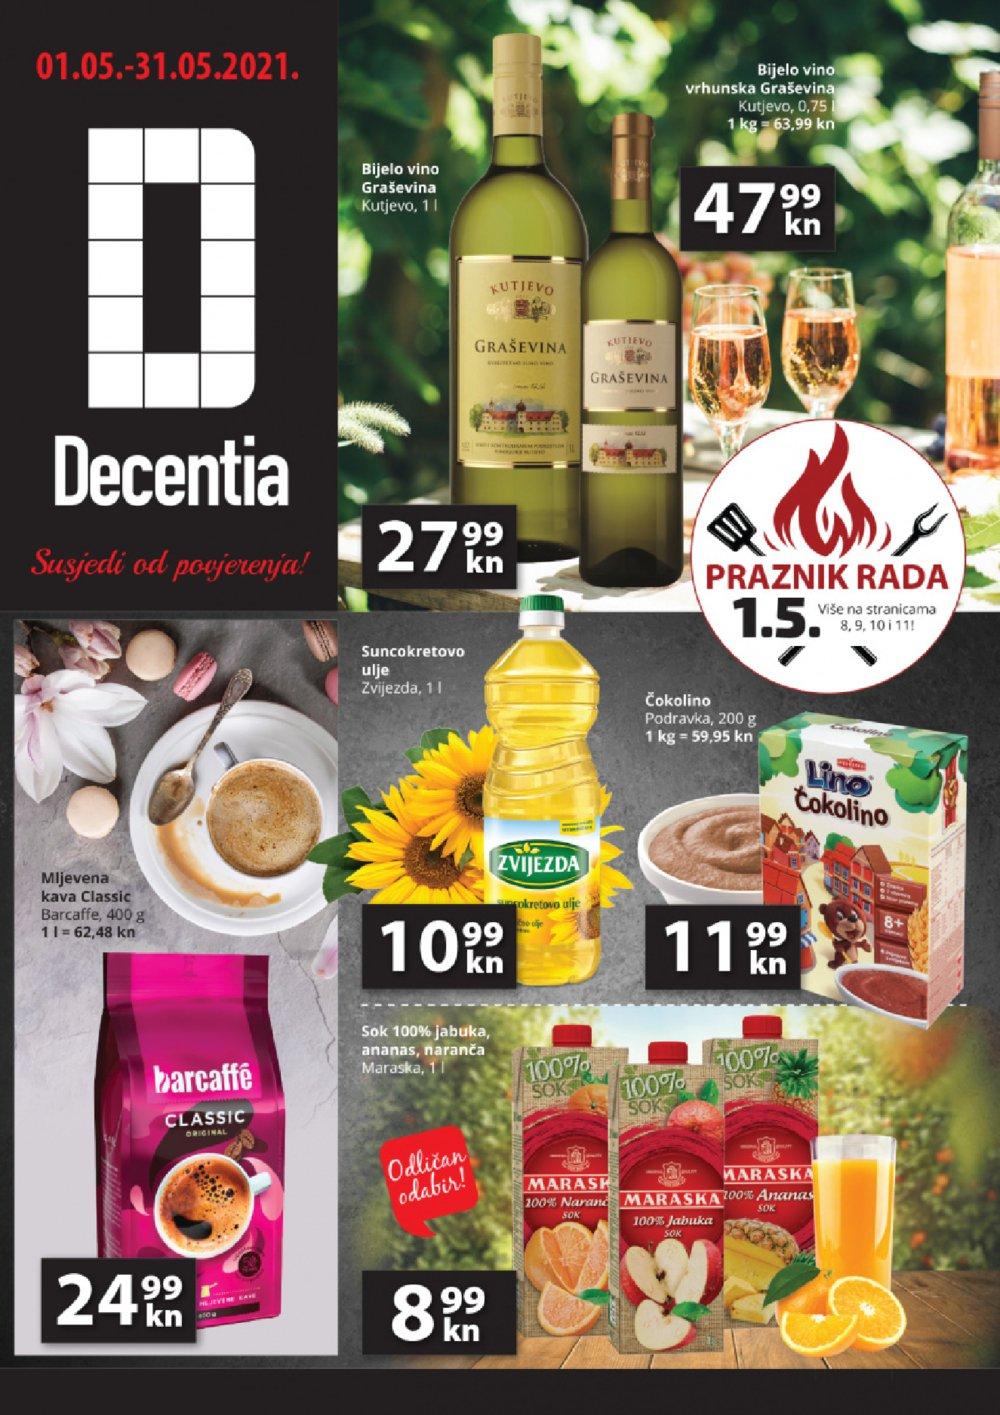 Decentia katalog Akcija 01.05.-31.05.2021.